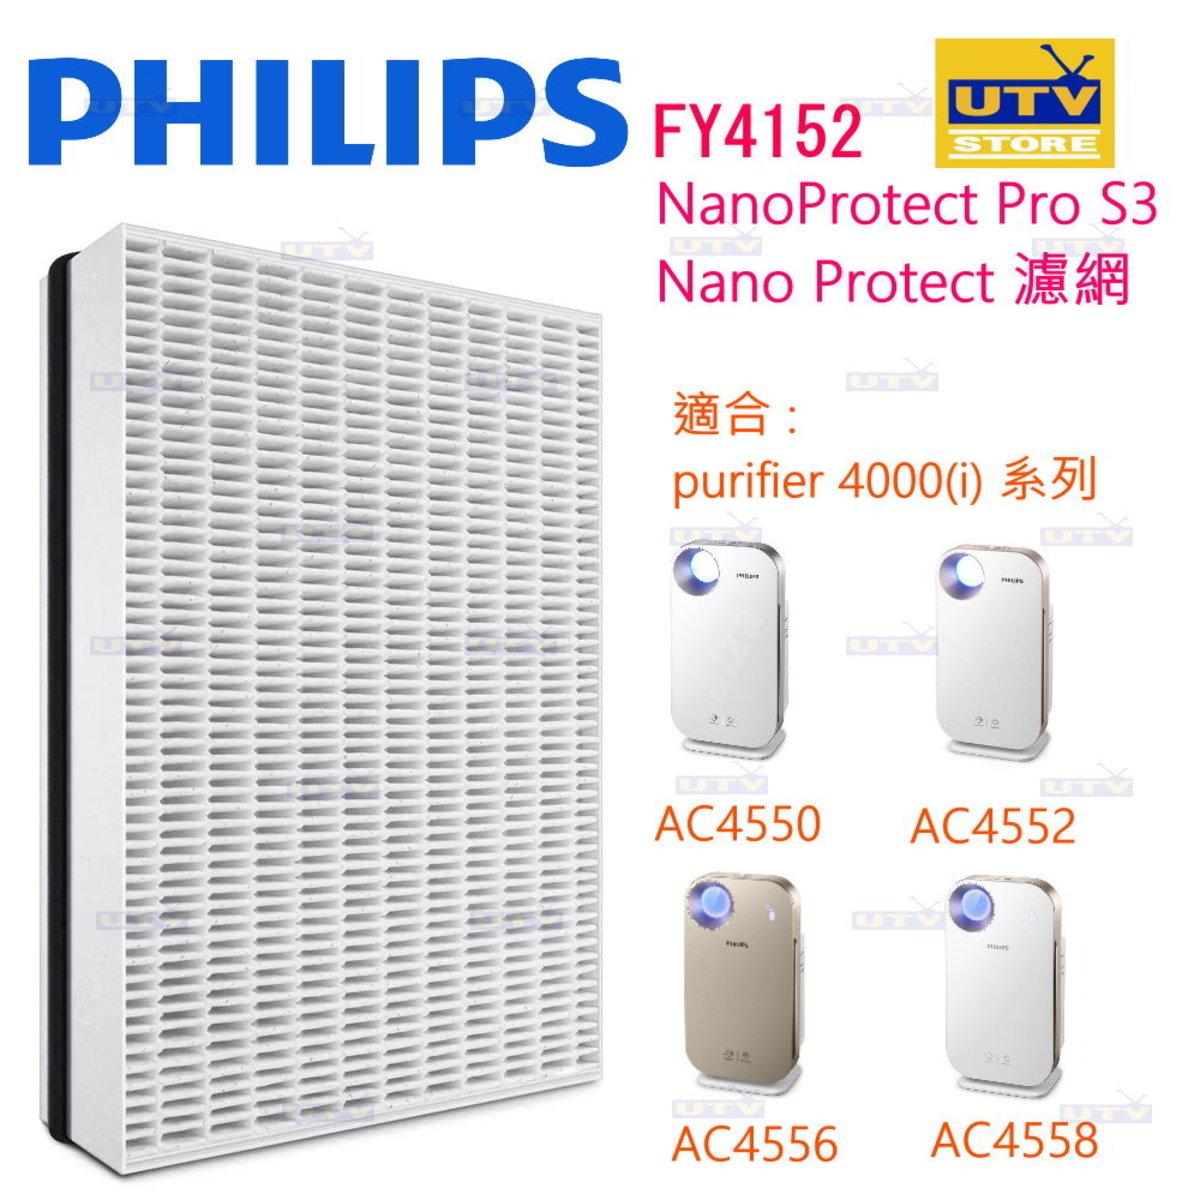 FY4152 NanoProtect Pro S3 Nano Protect 濾網